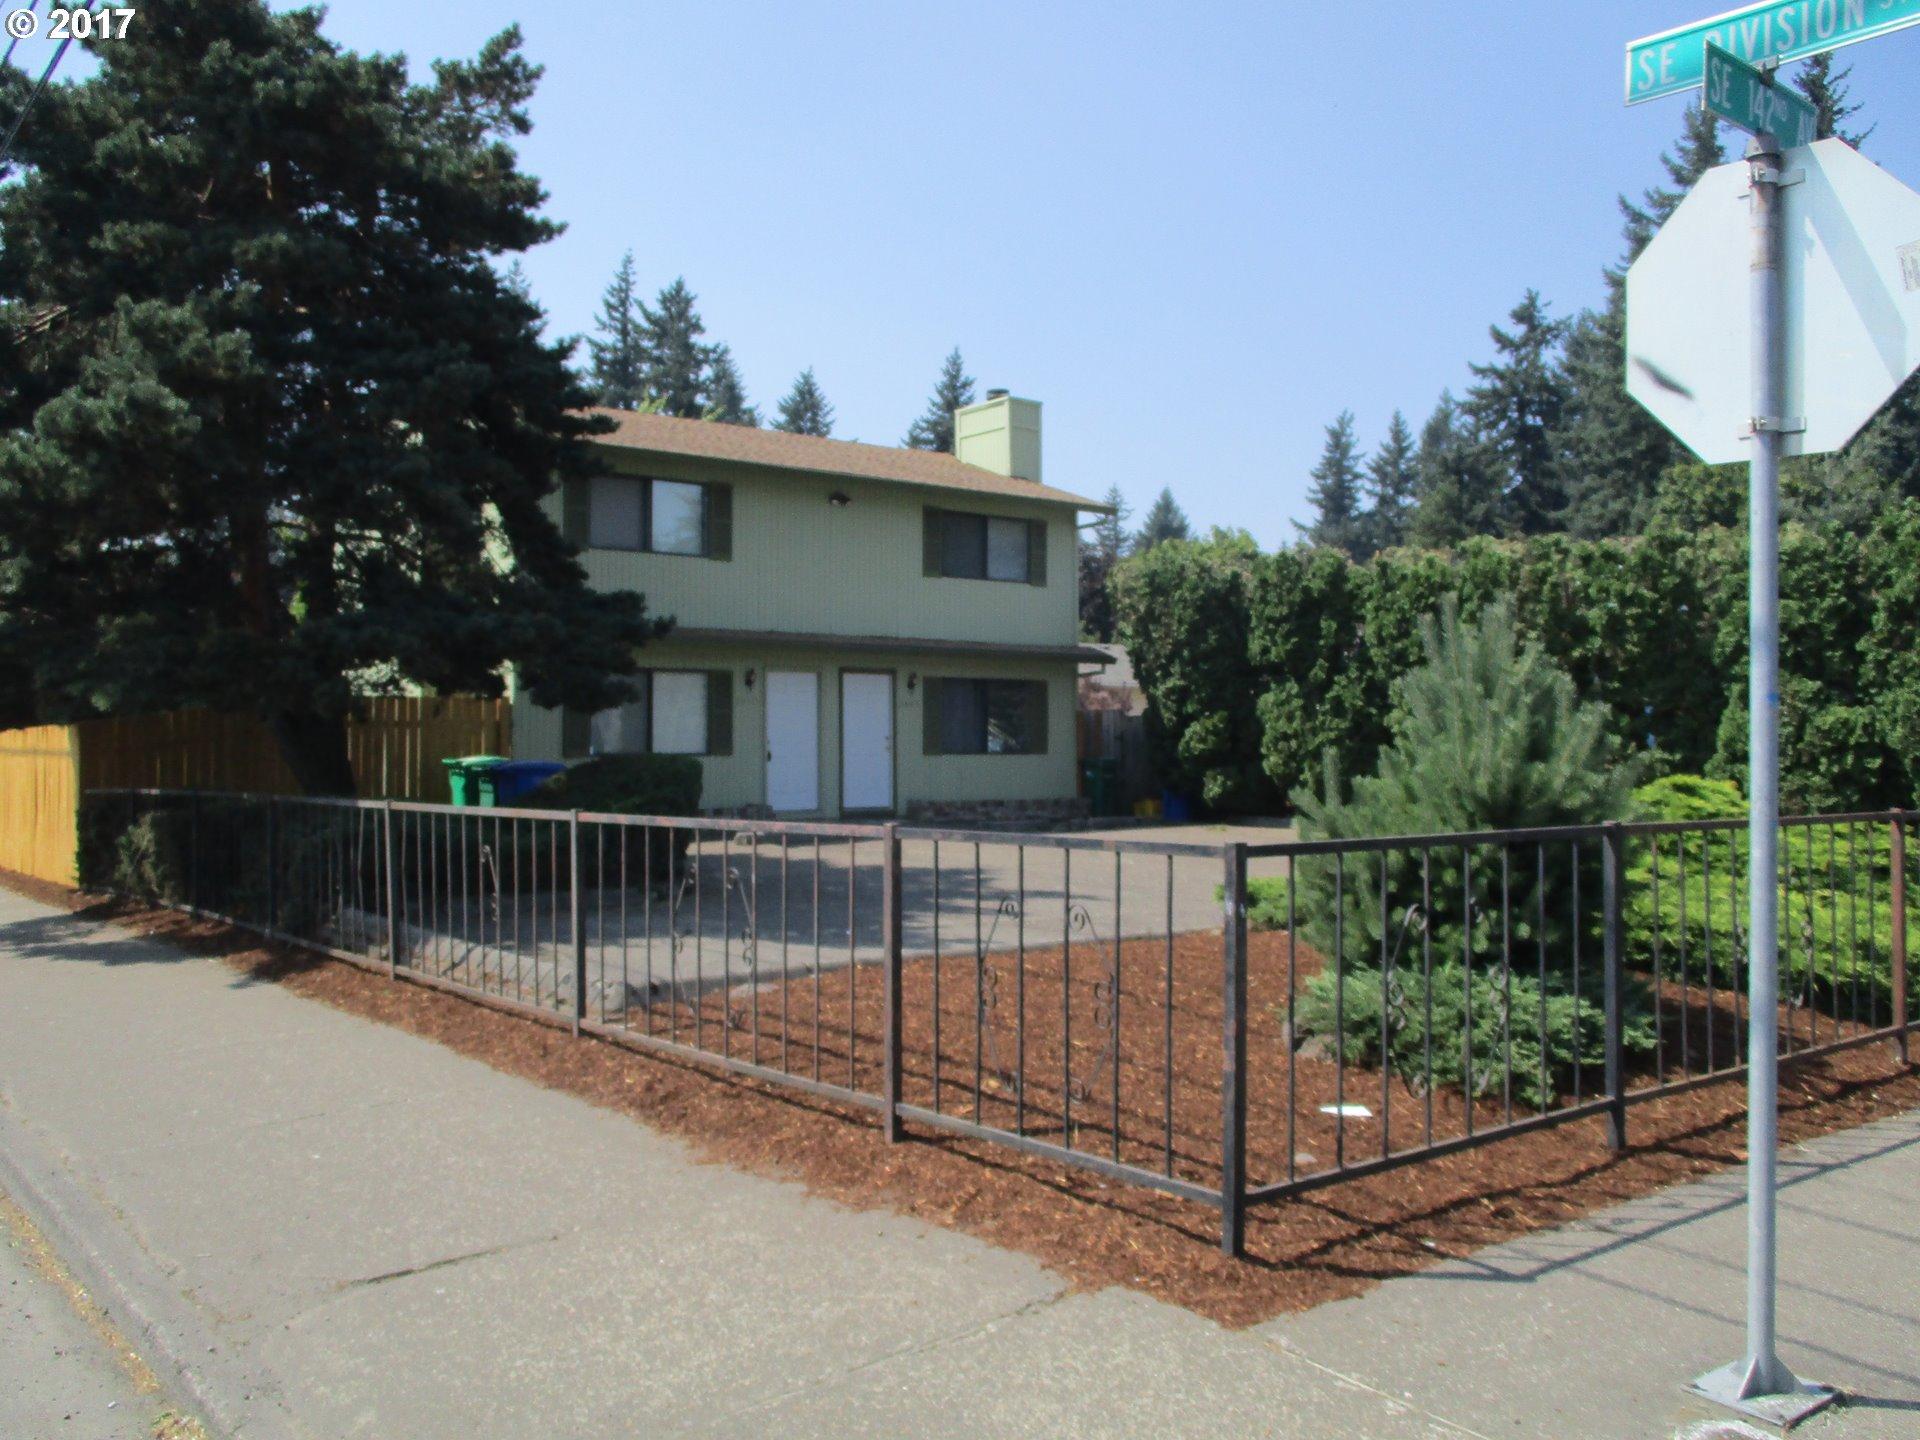 2443 SE 142ND AVE, Portland, OR 97233